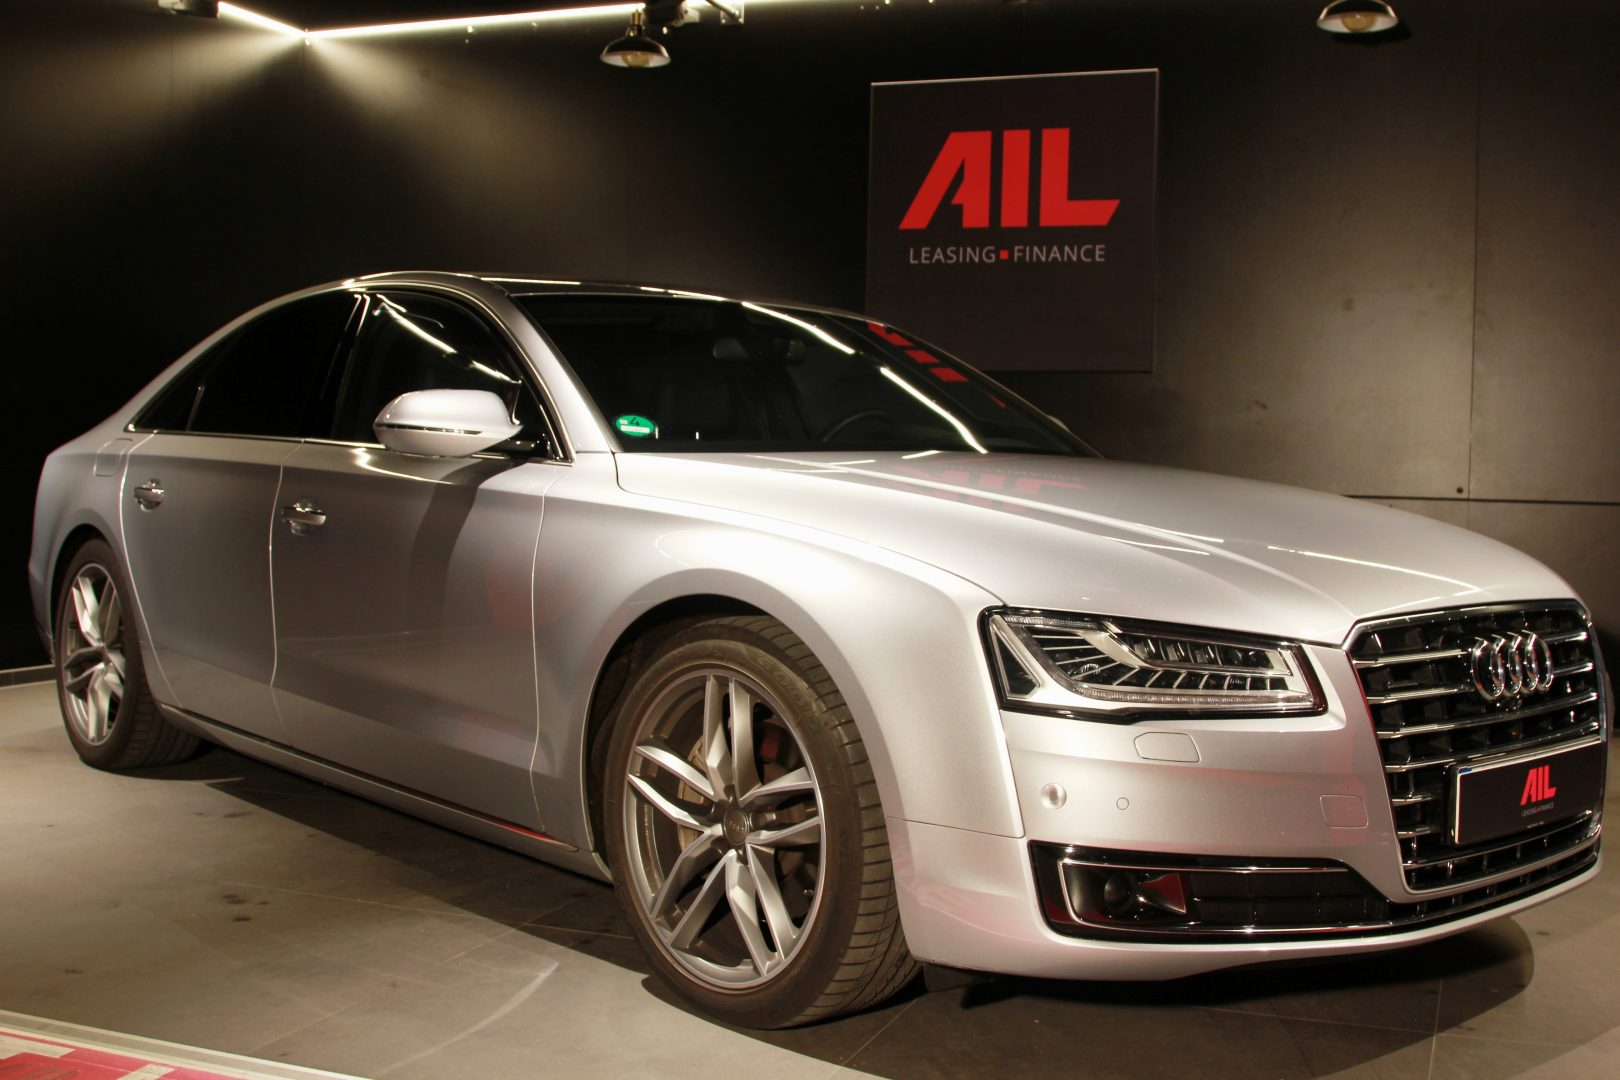 AIL Audi A8 3.0 TDI DAB Bose  1